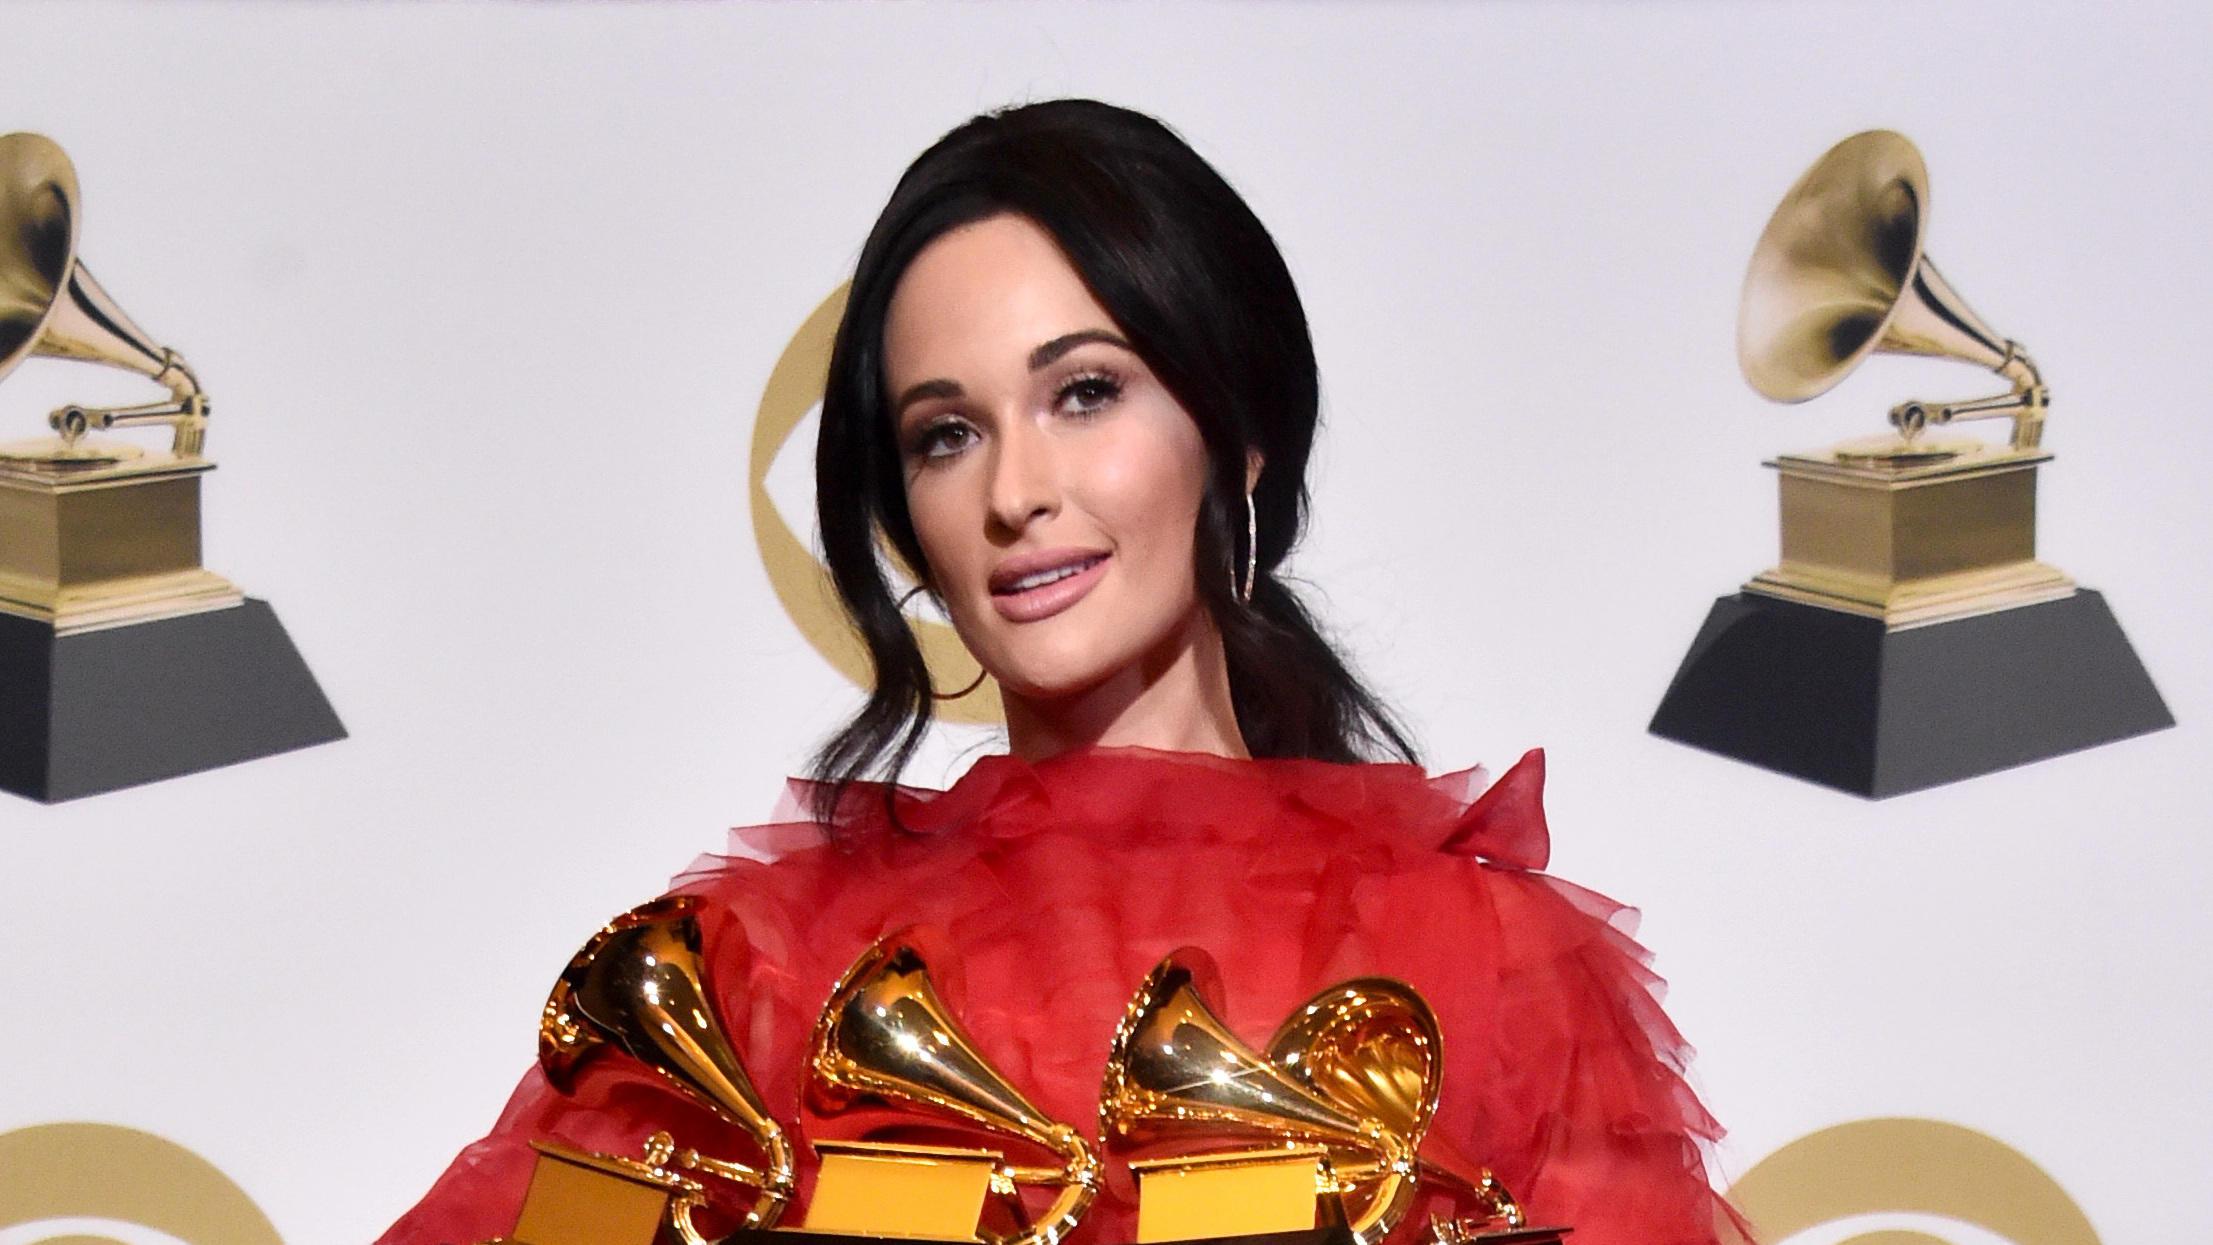 2019 Grammys: 10 Takeaways From The 2019 Grammy Awards